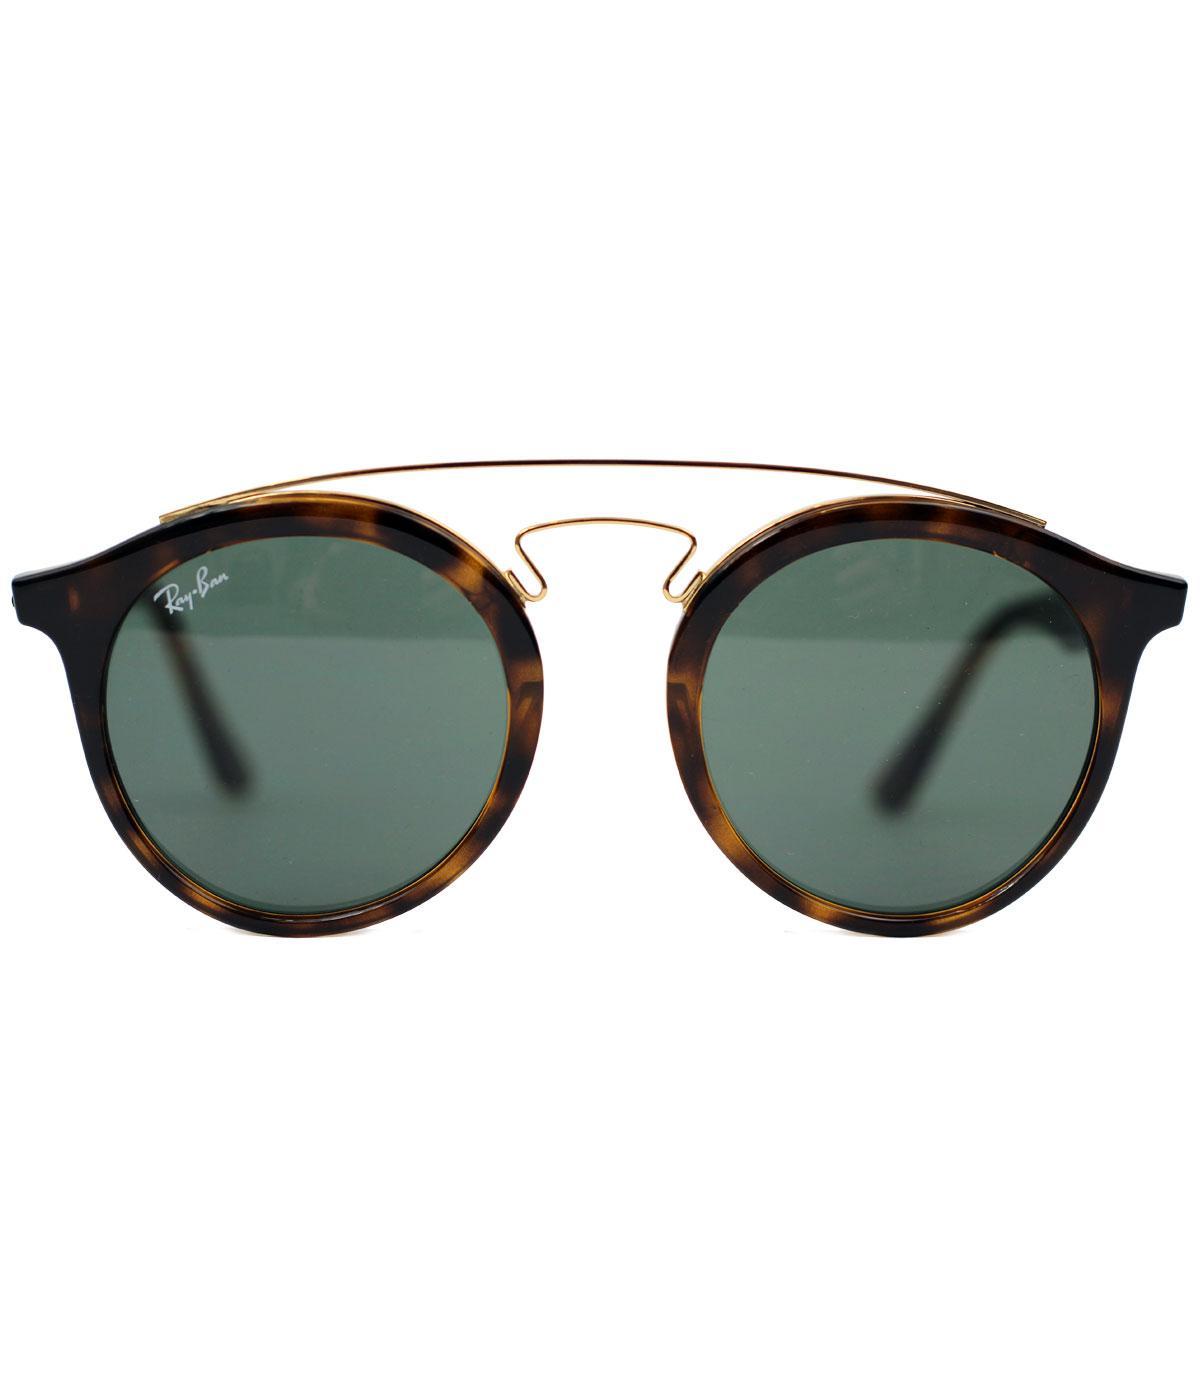 Teashades RAY-BAN Mod Round Clubmaster Sunglasses